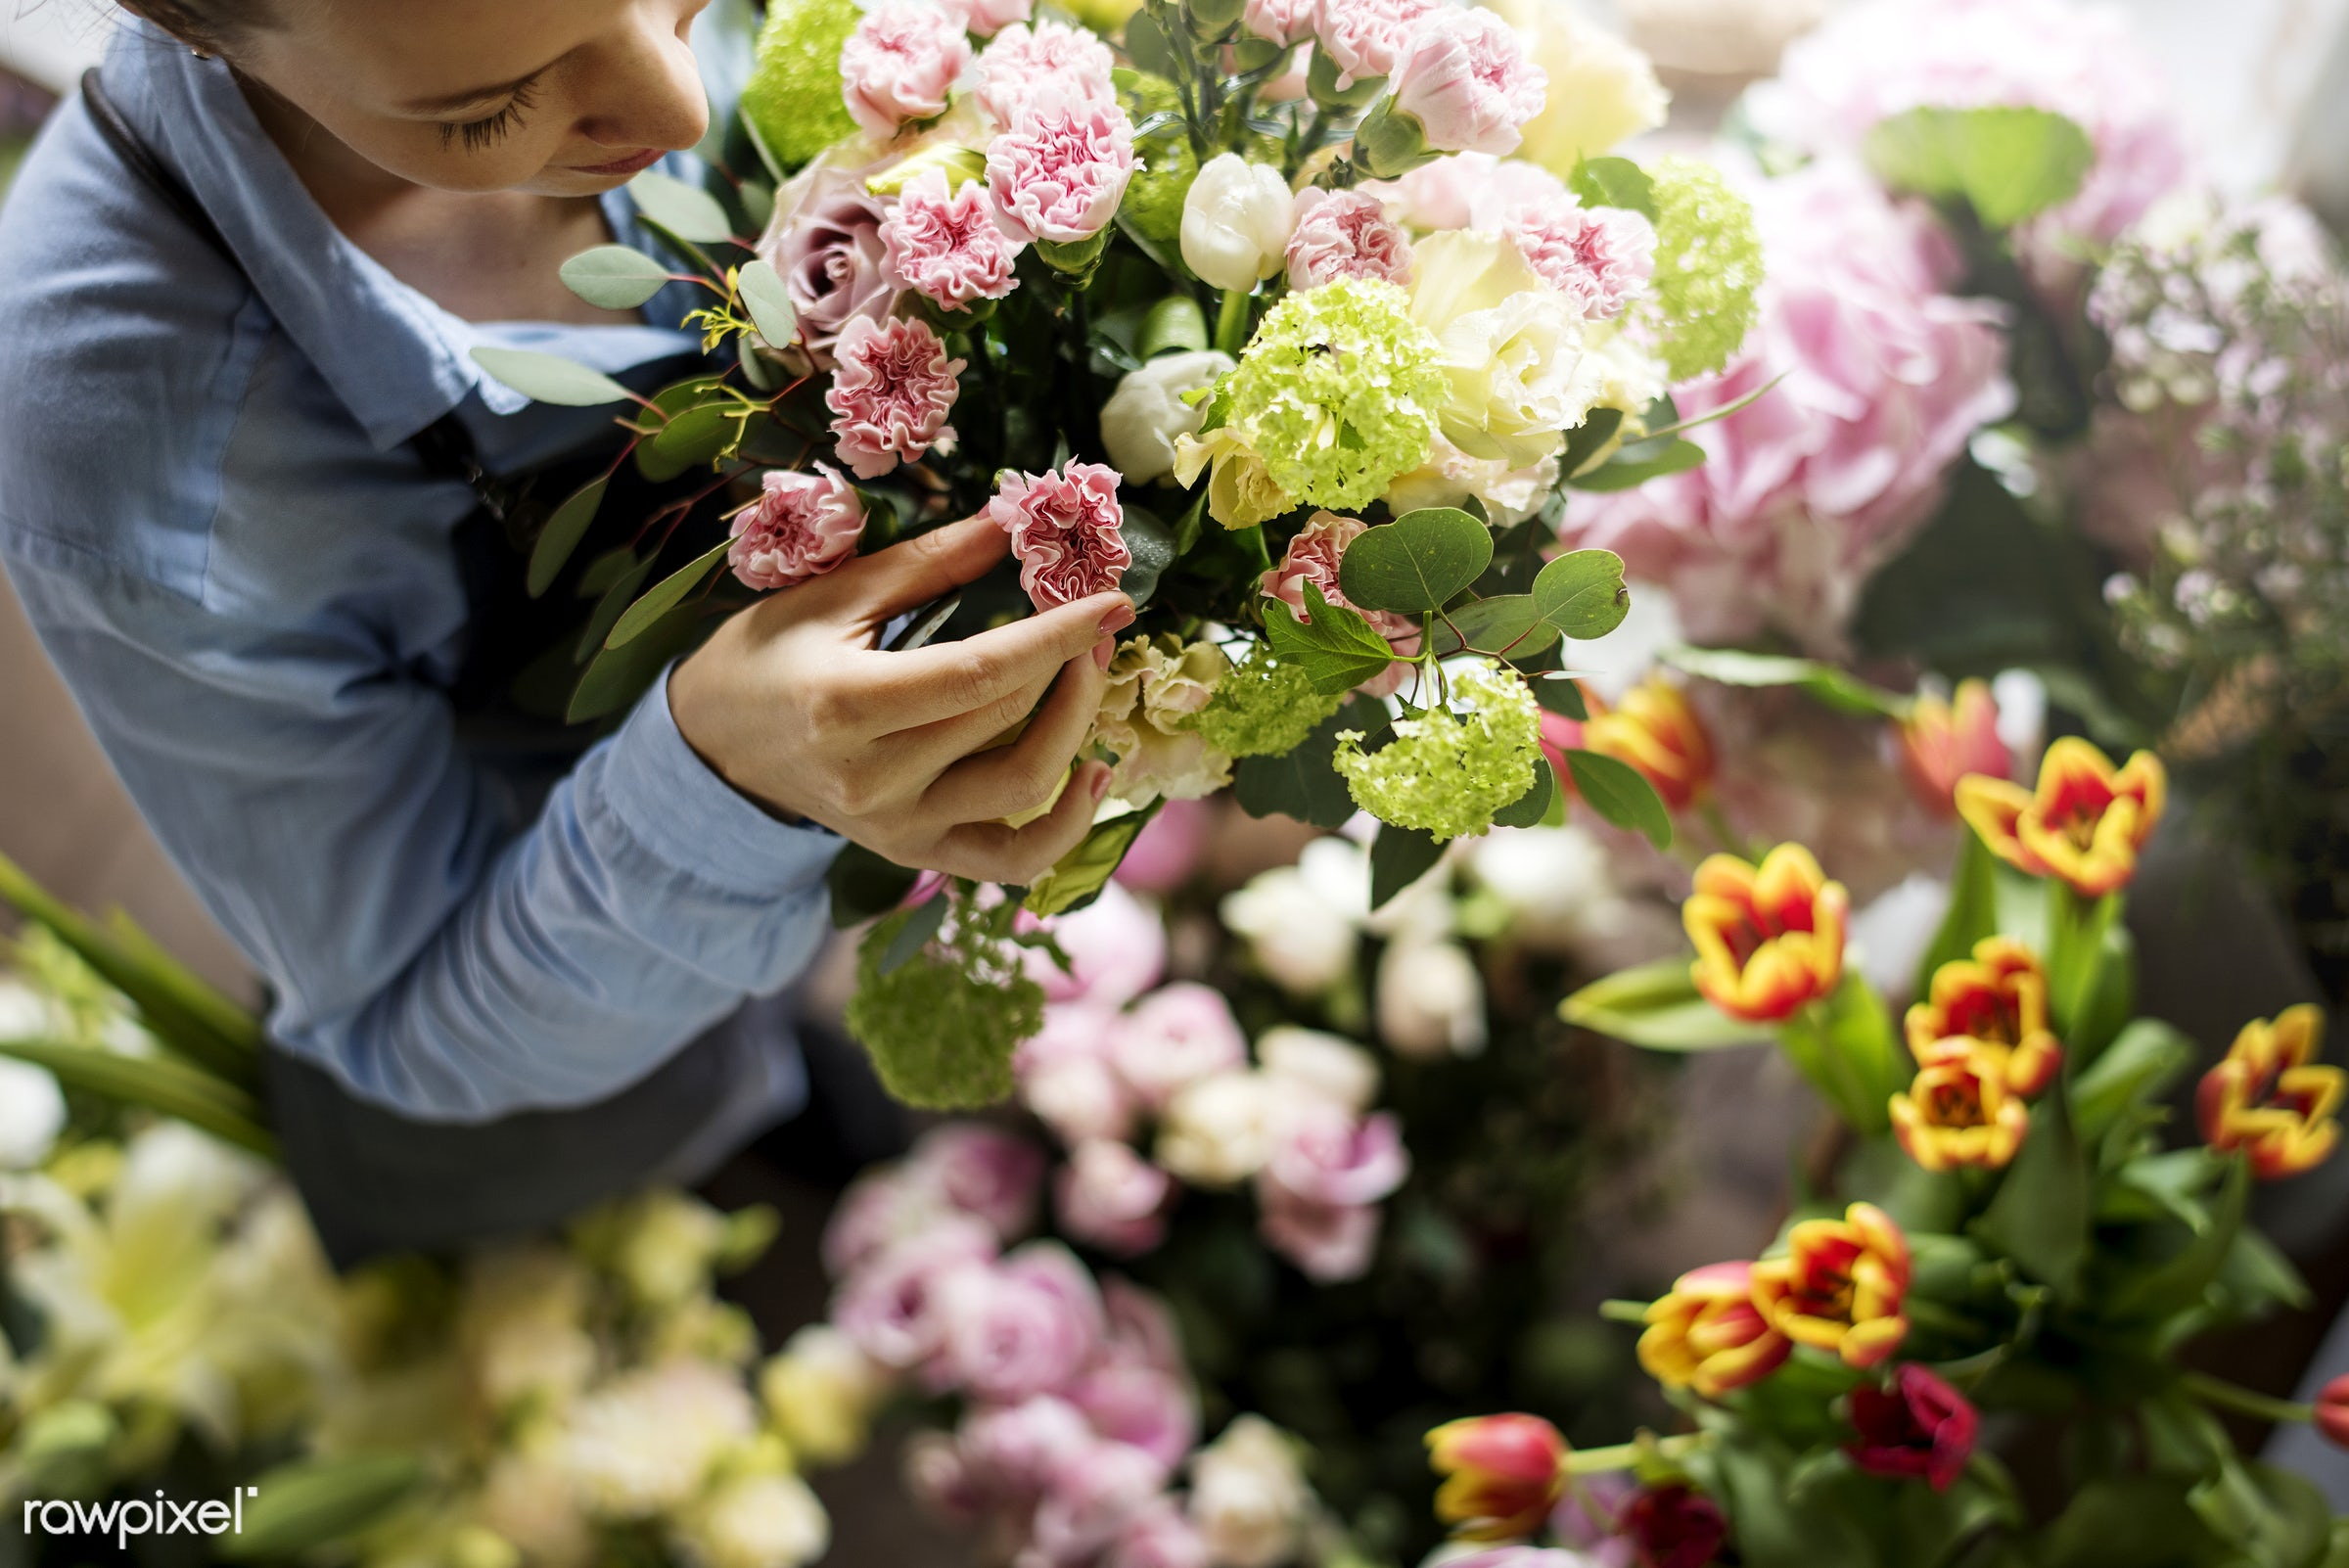 Close up florist flower arrangement skill - flower, florist, arrangement, decoration, skill, art, hobby, design, fresh, real...